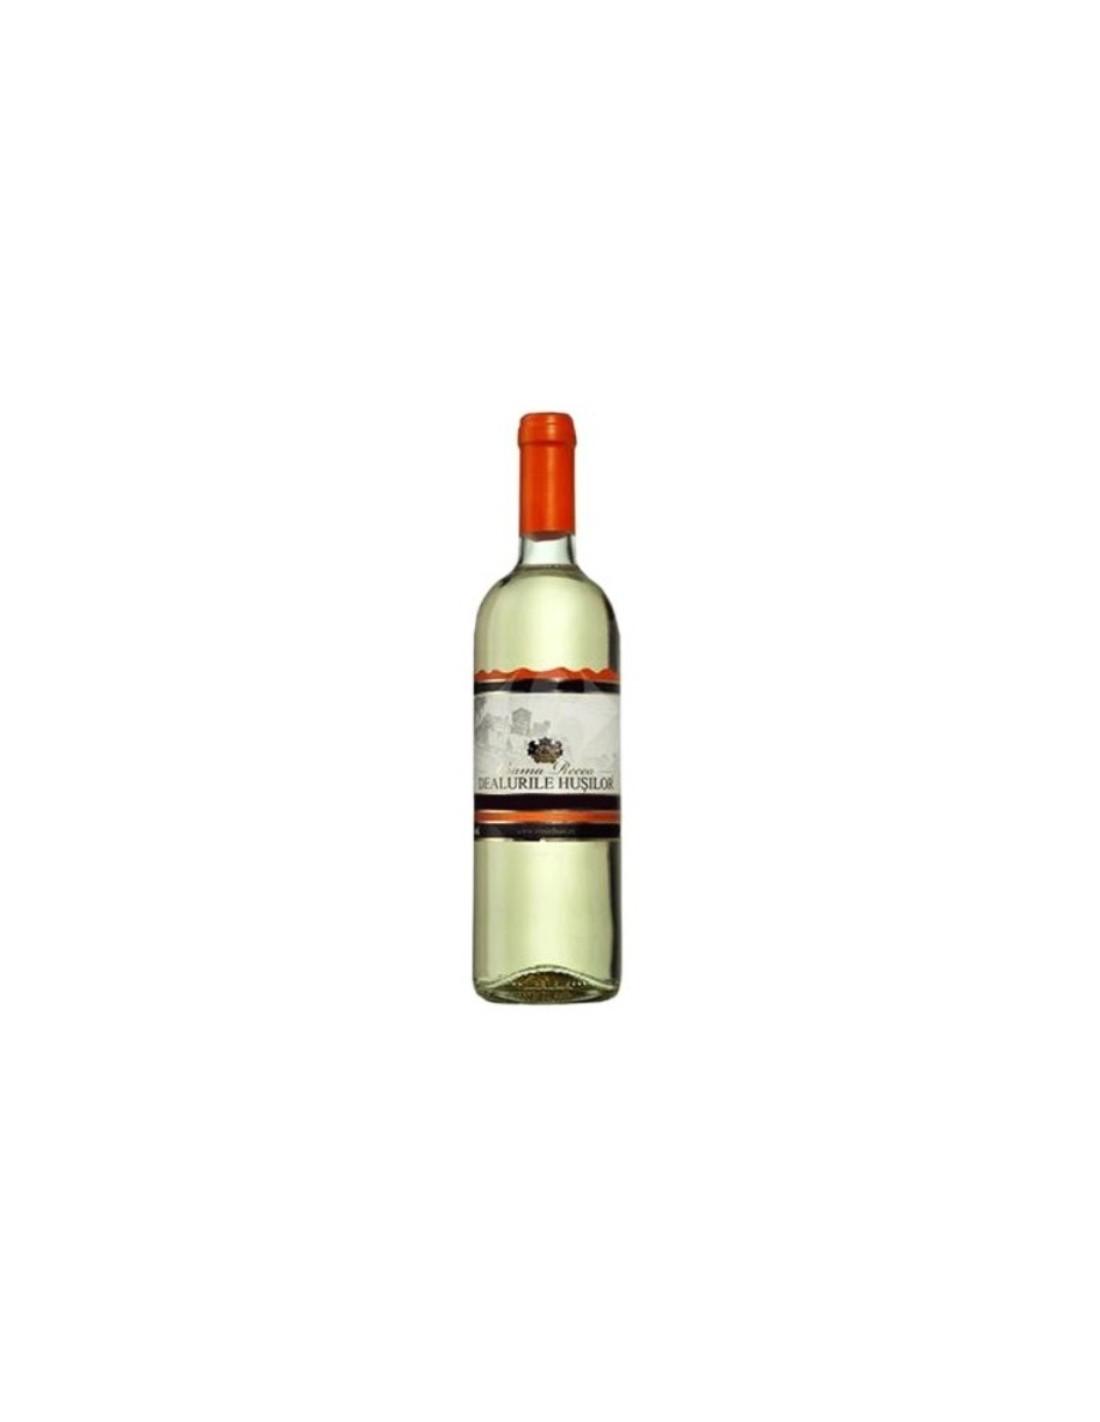 Vin alb demisec, Crama Recas Dealurile Husilor, 0.75L, 10.5% alc., Romania